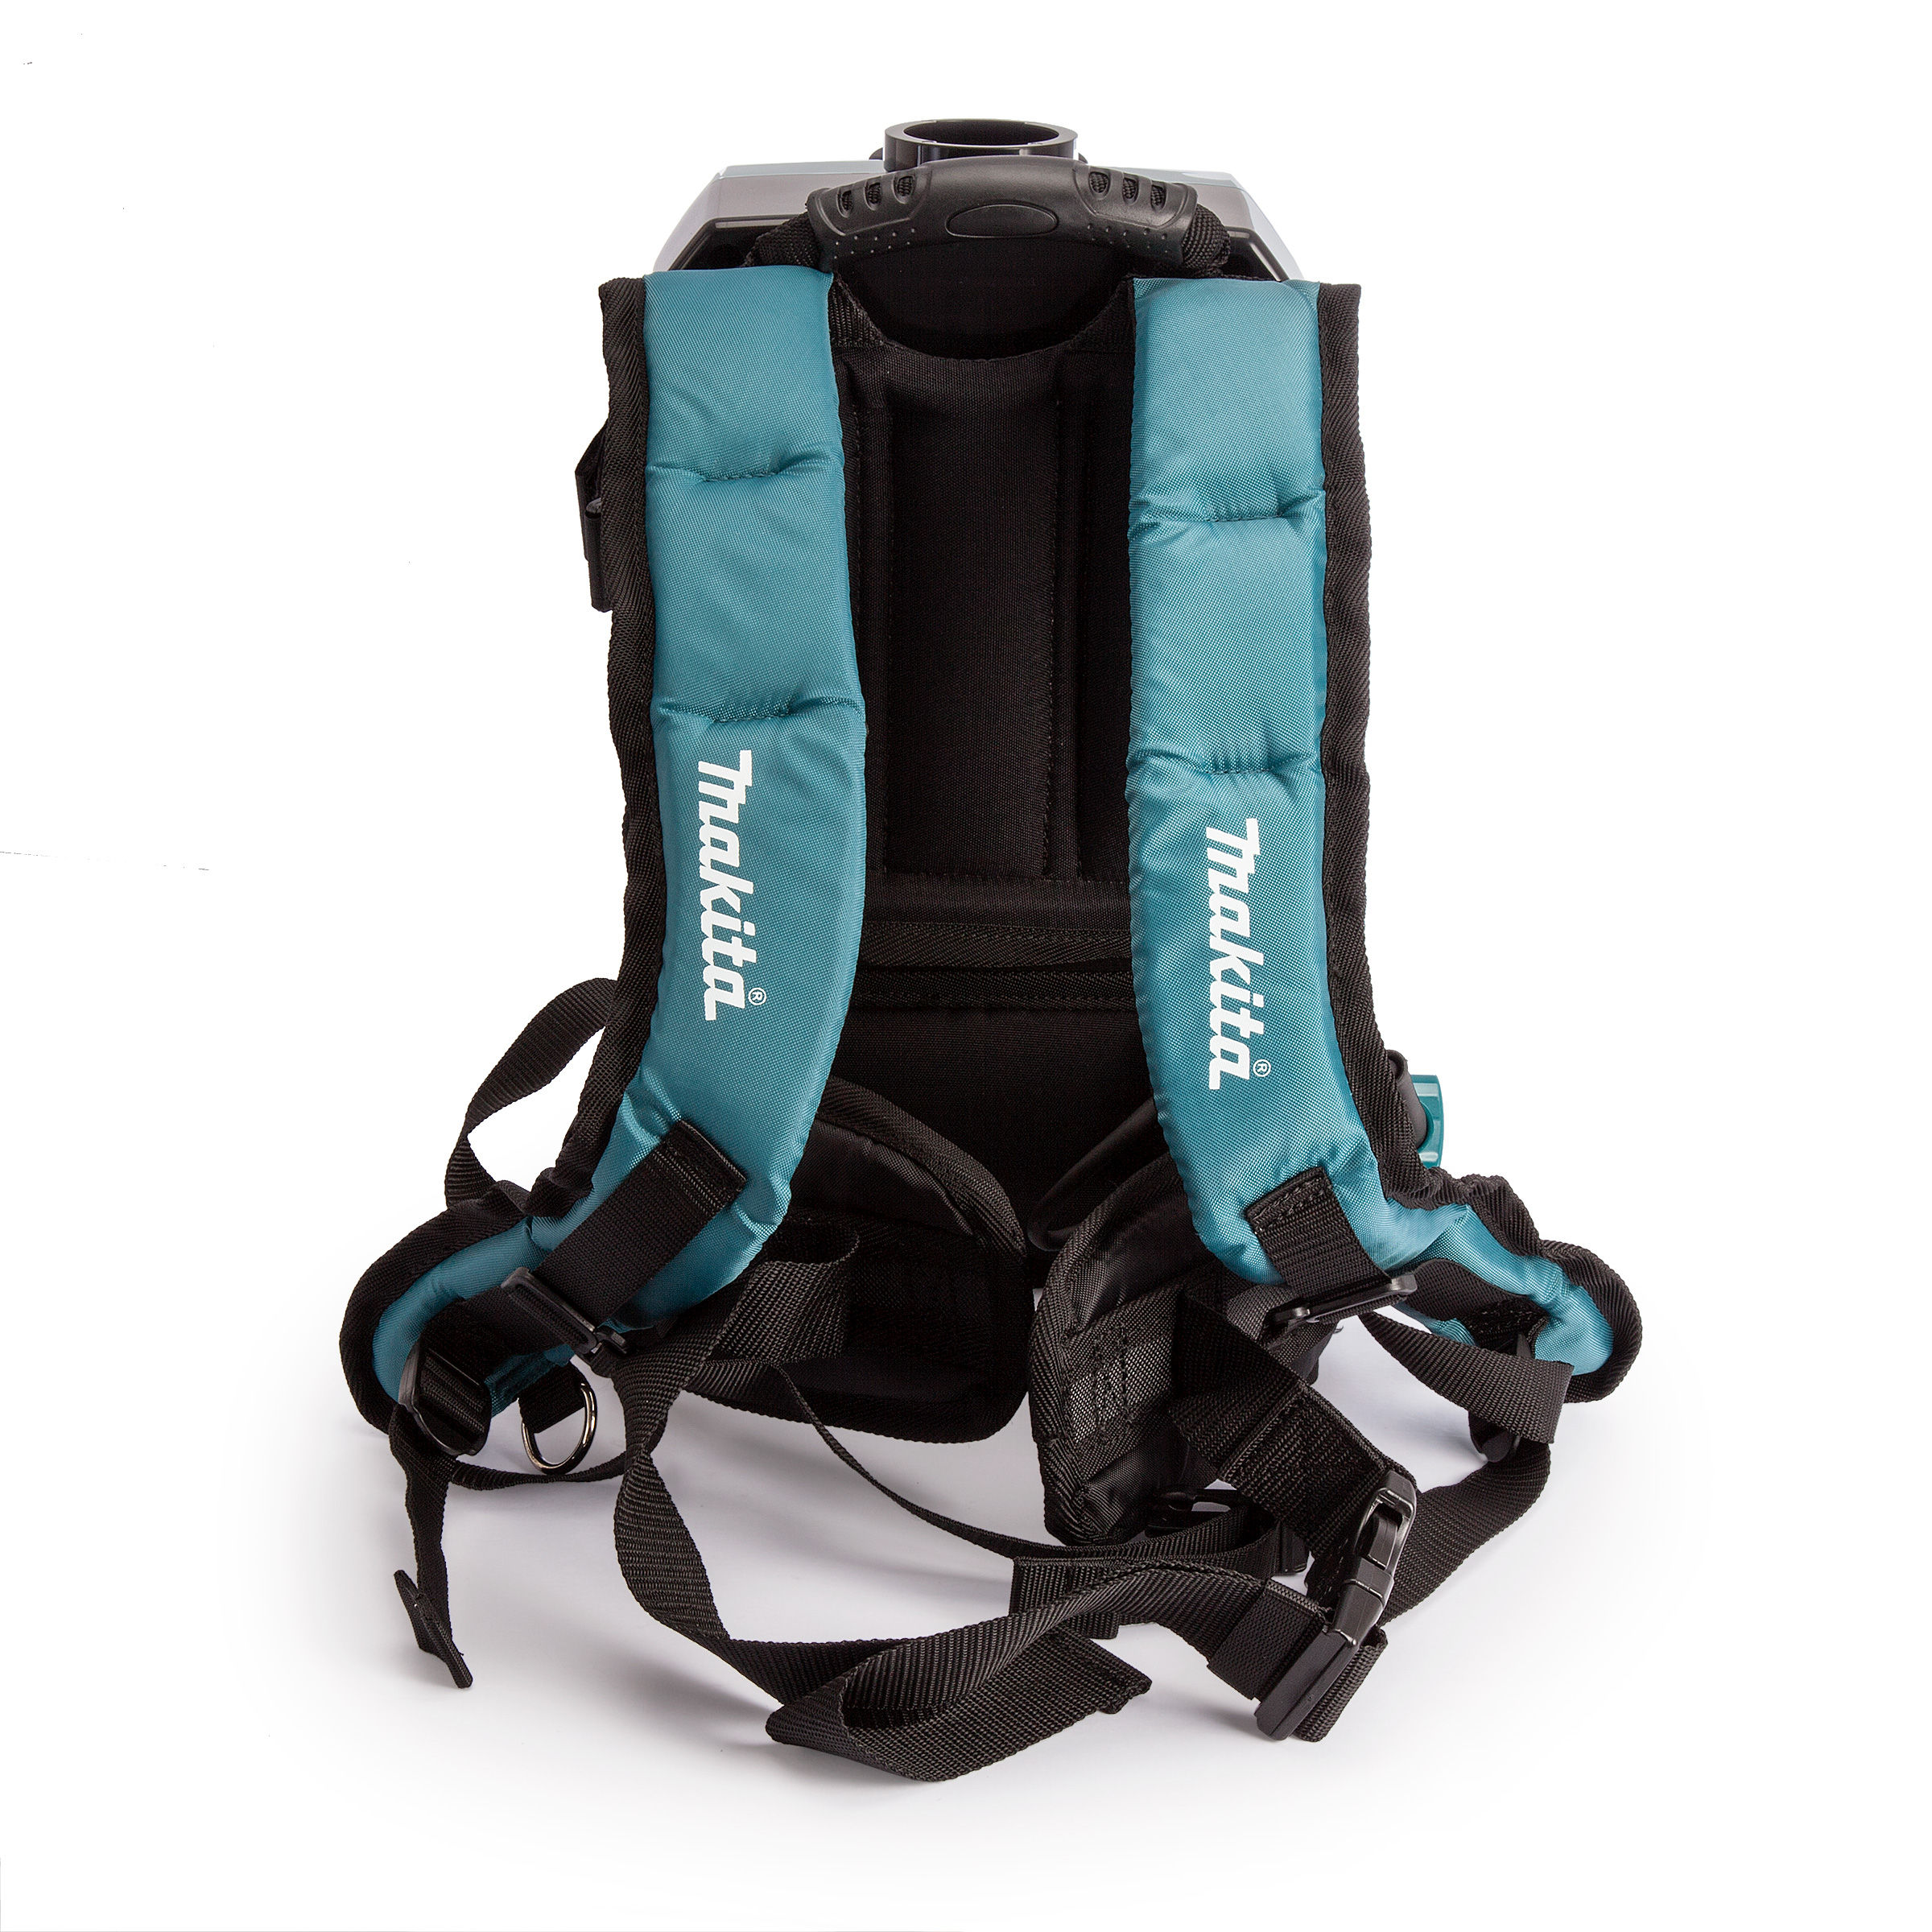 Toolstop Makita Dvc260z Cordless Backpack Vacuum Cleaner 2